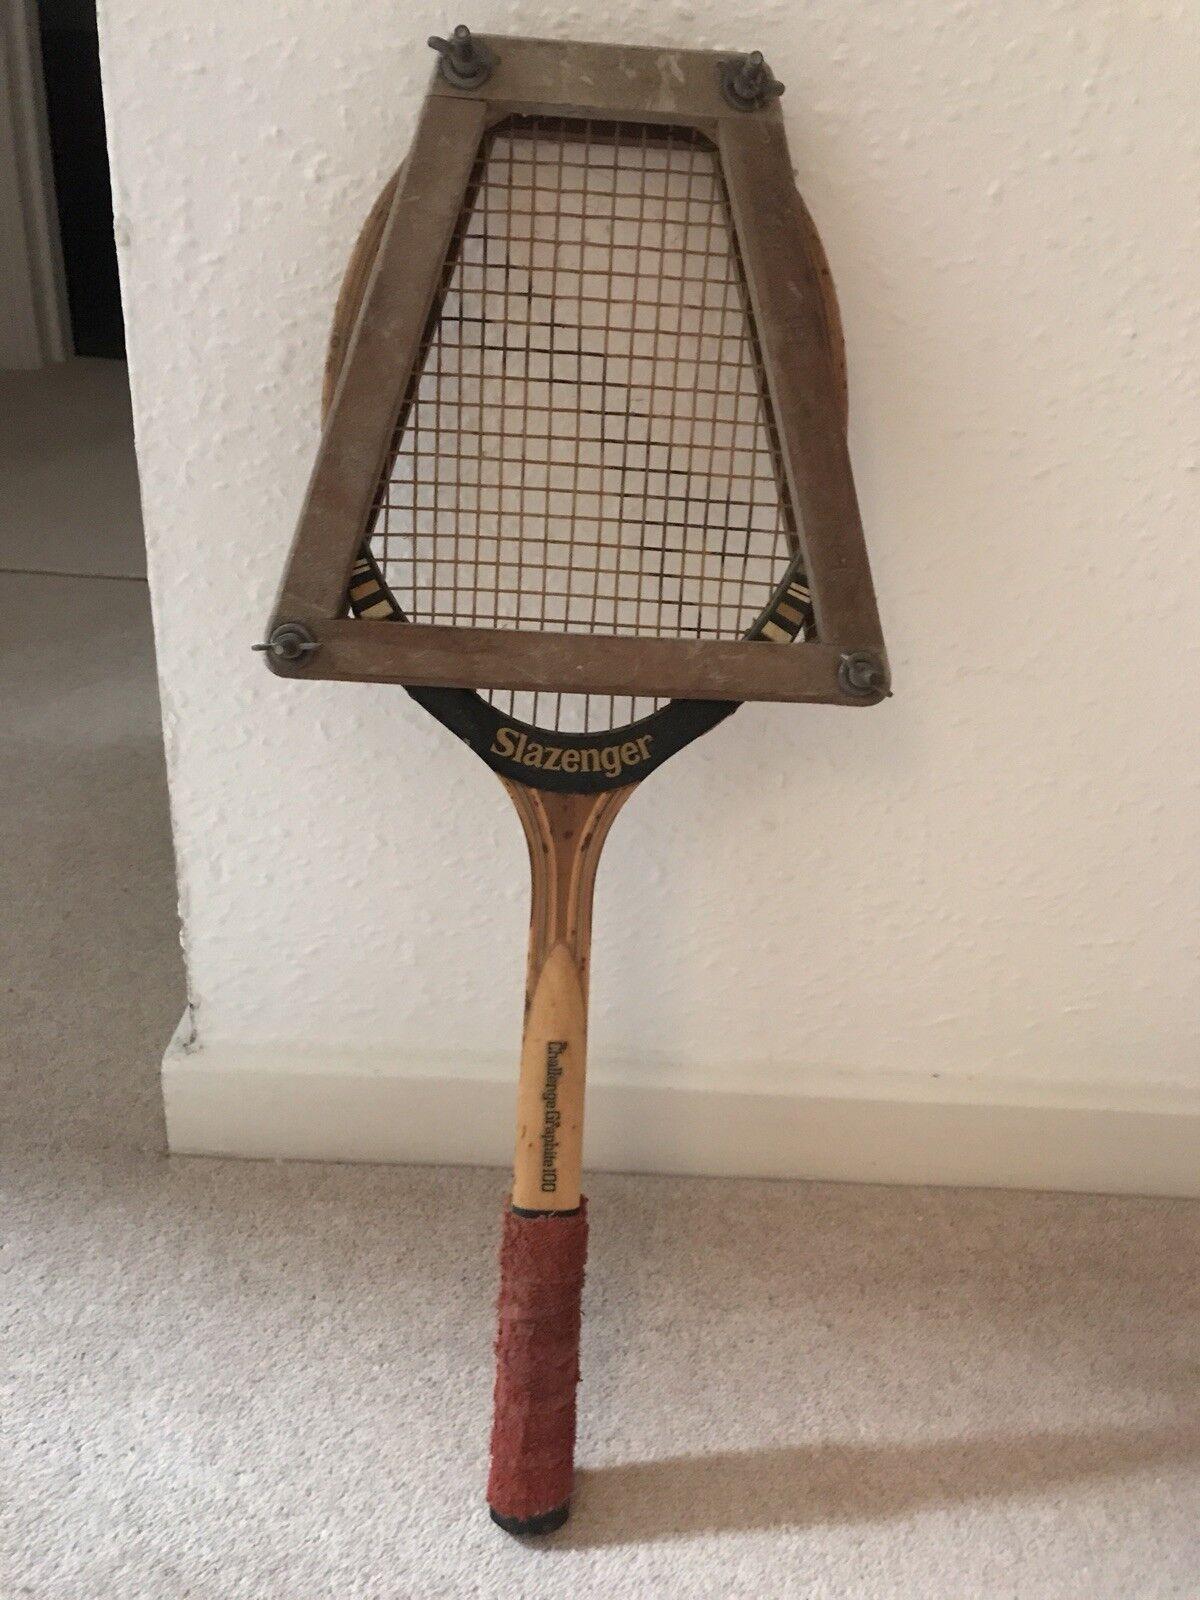 Slazenger Challenge Graphite 100 Tennis Wooden Raquet